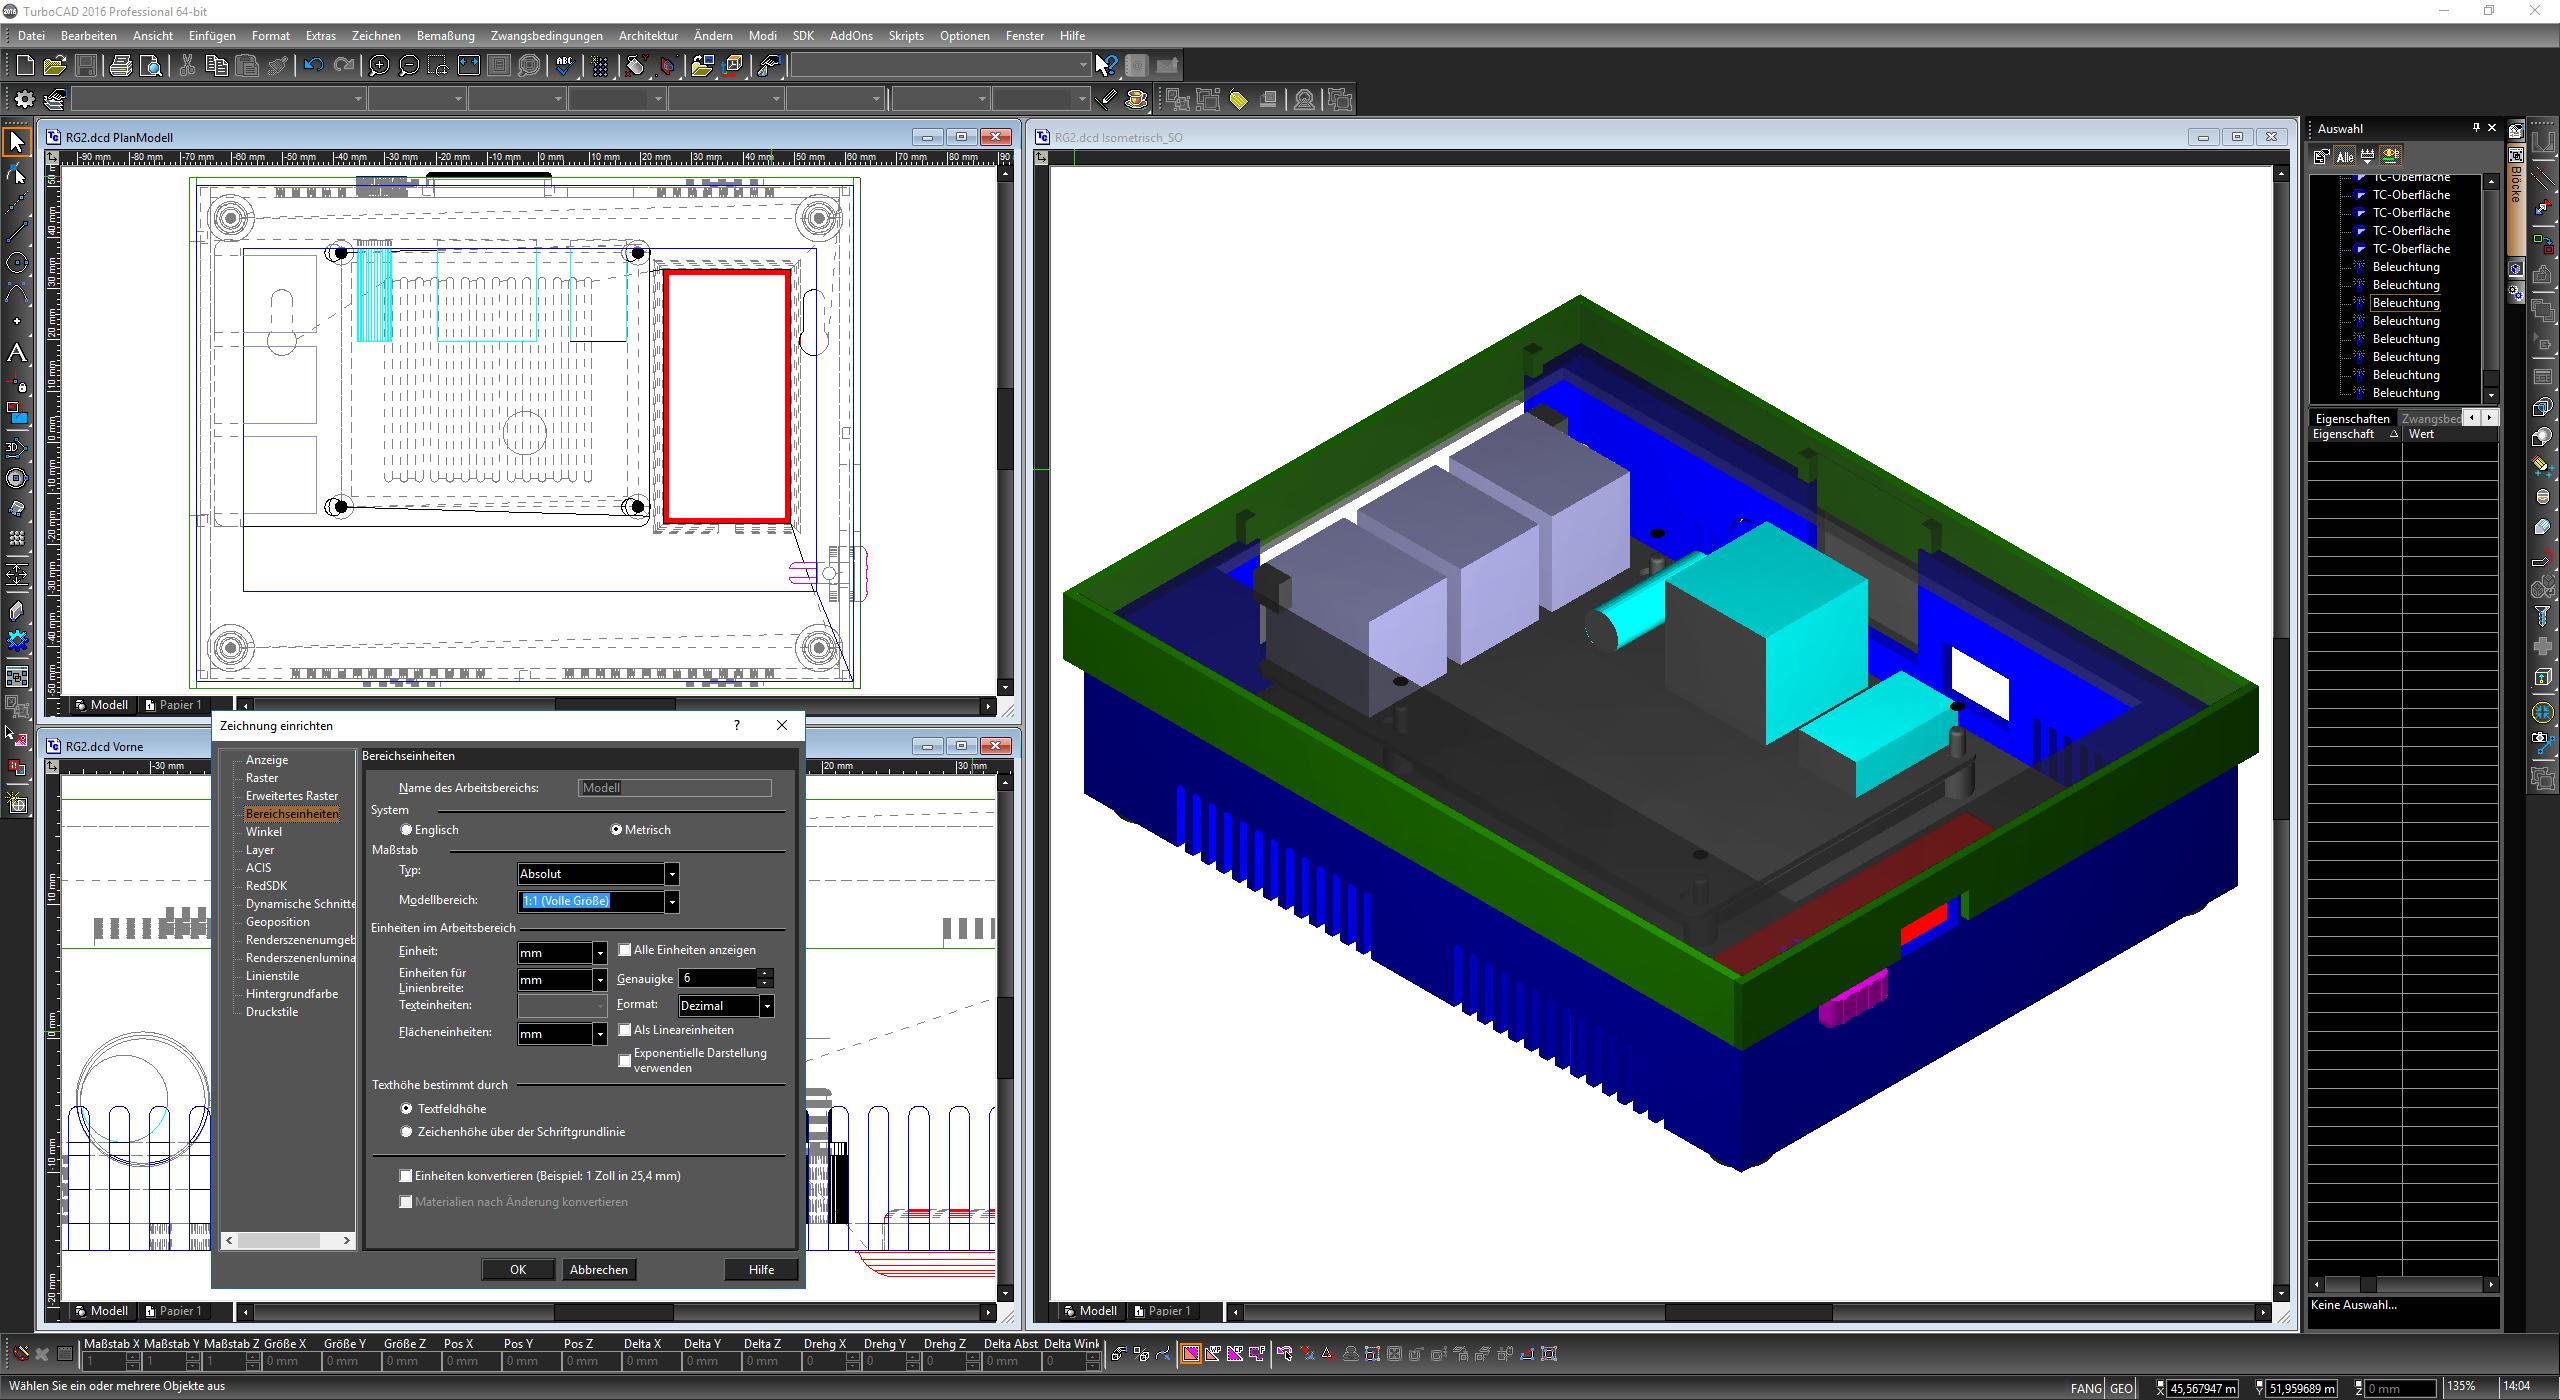 Erstklassige und professionelle 2D-/3D-CAD-Software